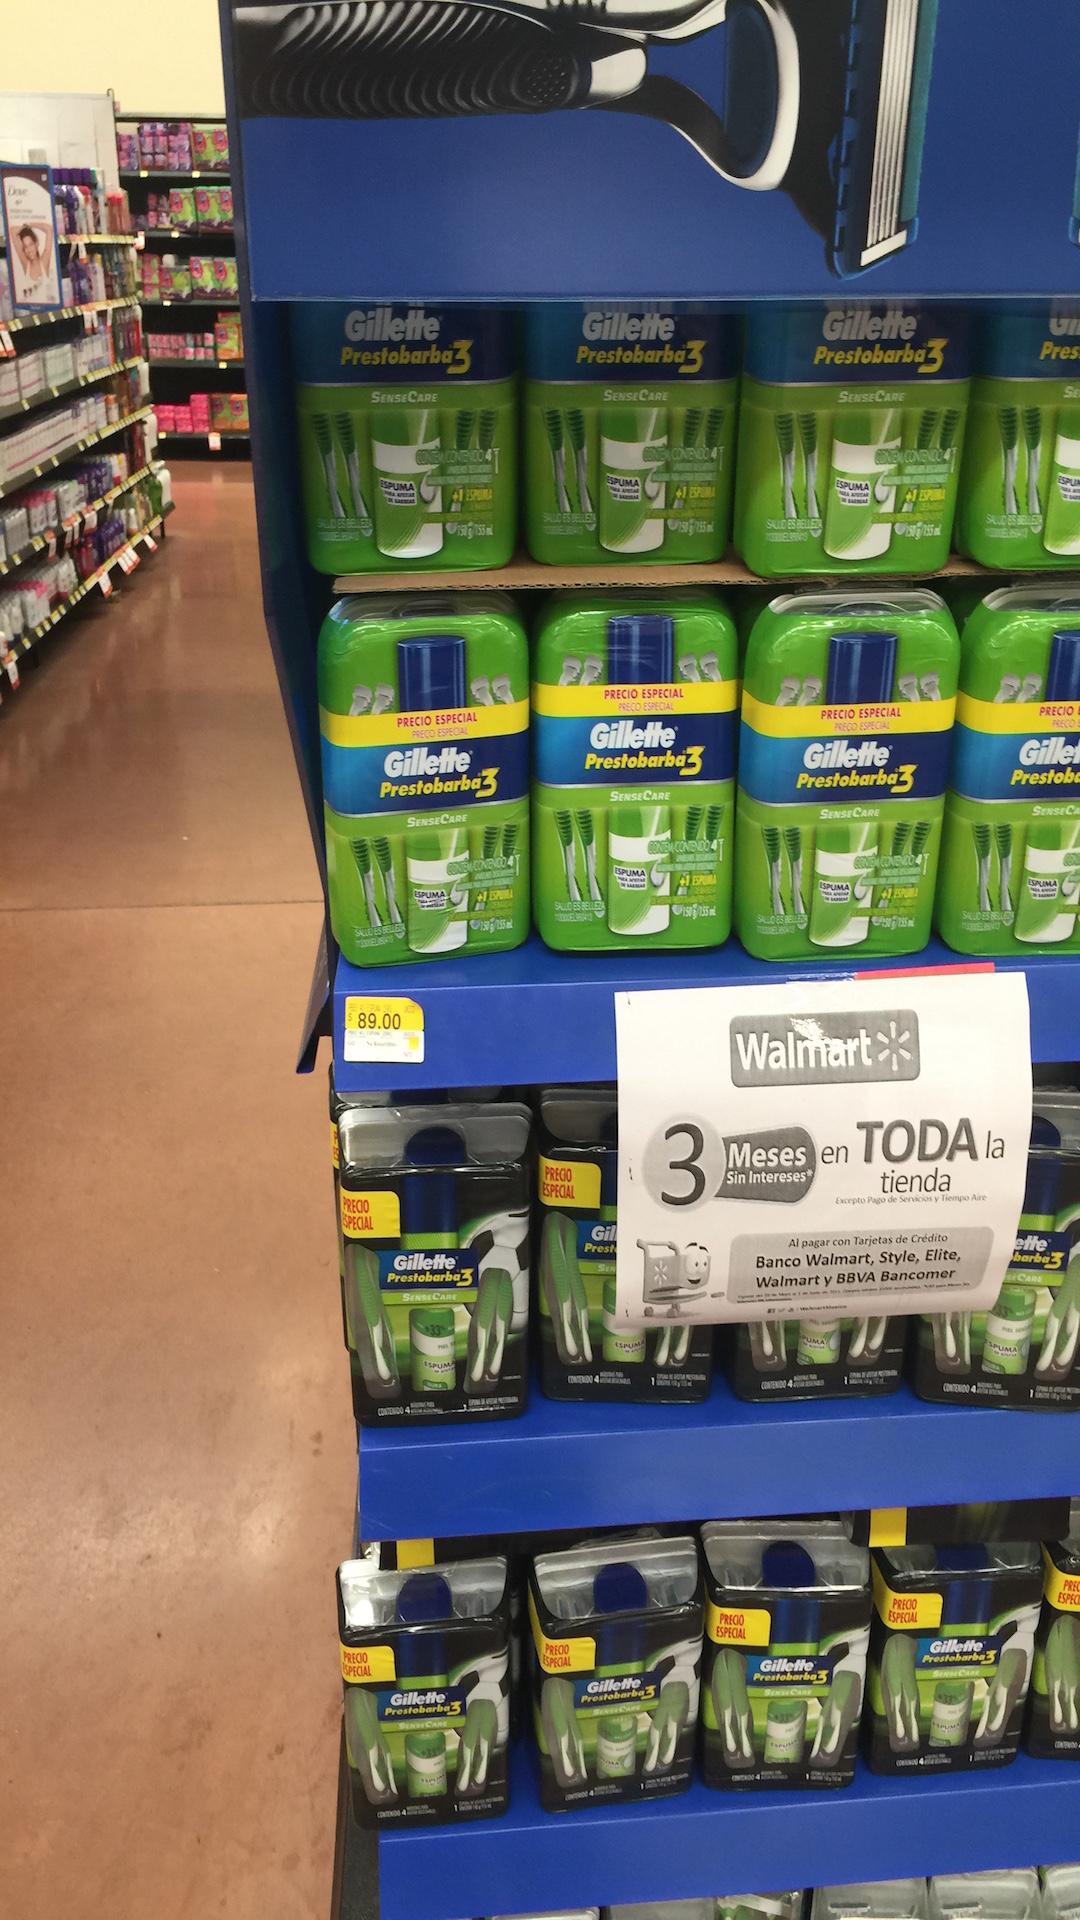 Walmart: 4 rastrillos Gillette Prestobarba 3 + crema para afeitar $89